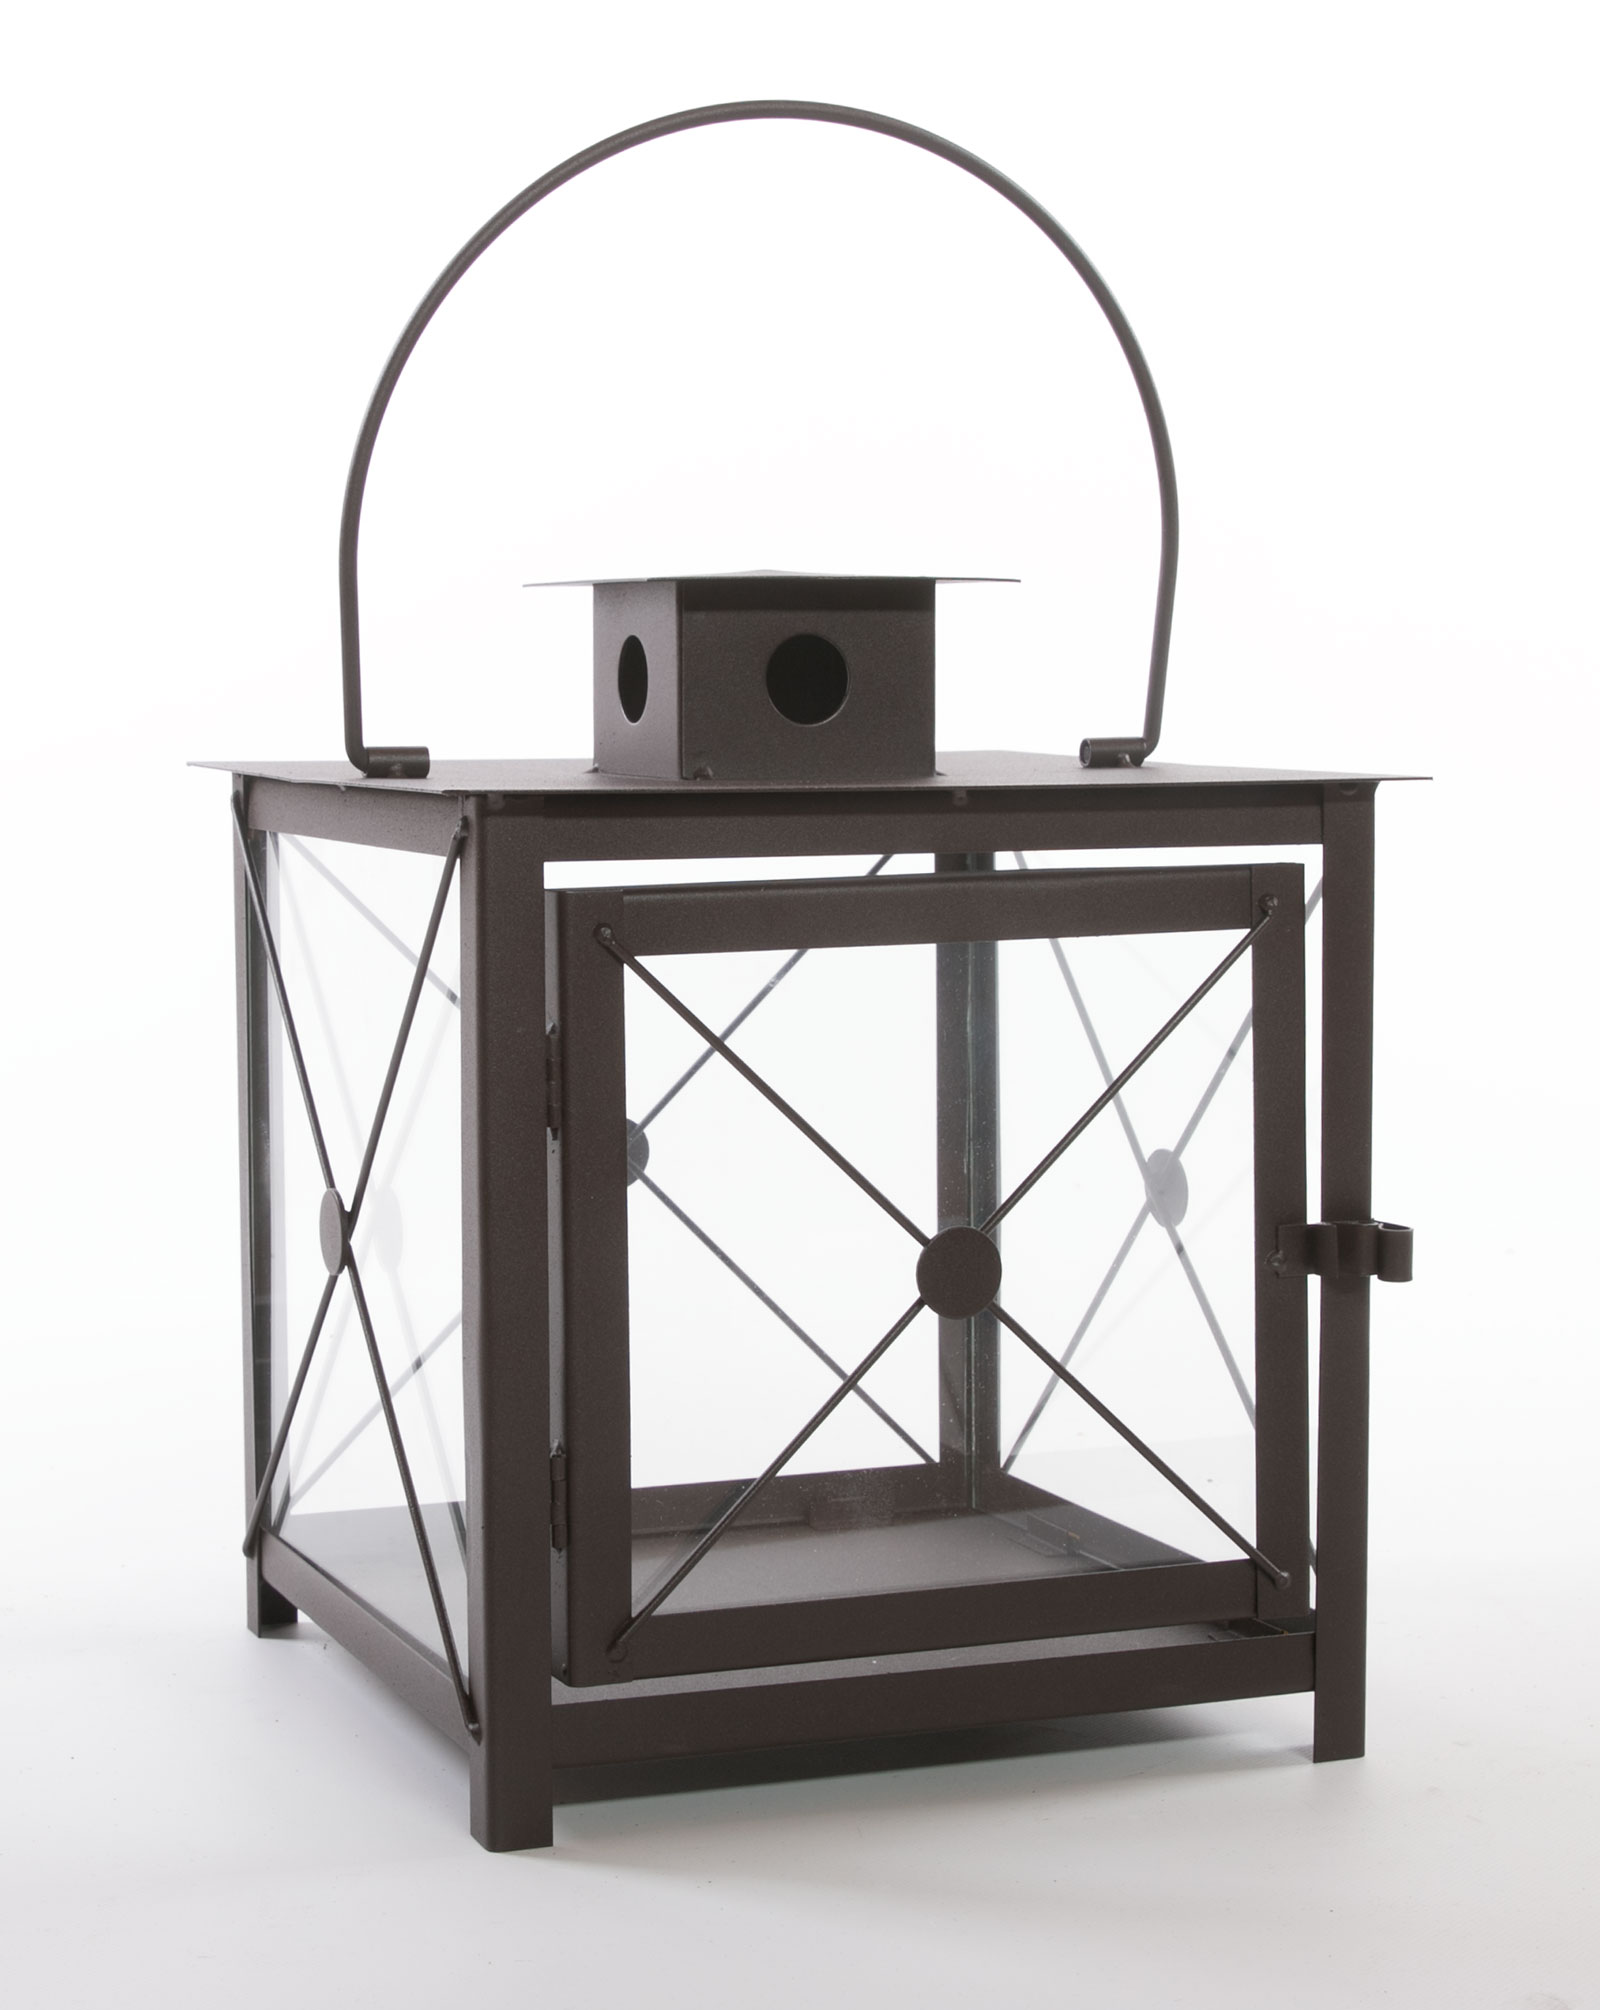 laterne metall braun nixon windlicht metalllaterne. Black Bedroom Furniture Sets. Home Design Ideas